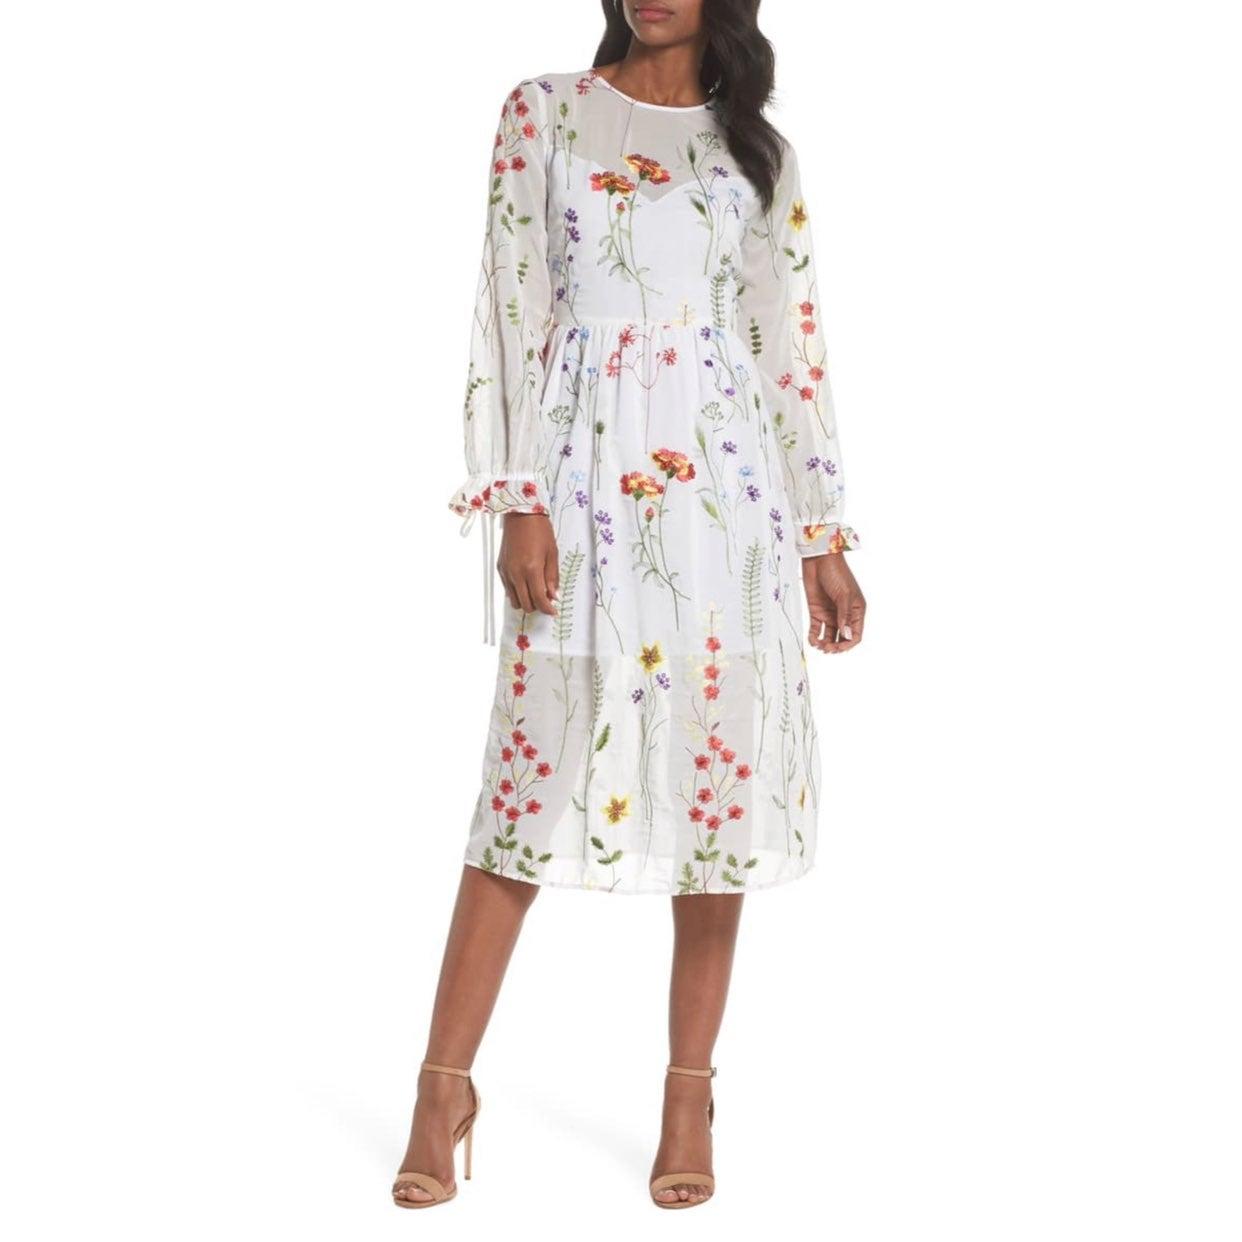 Chelsea28 Sheer Embroidered Midi Dress